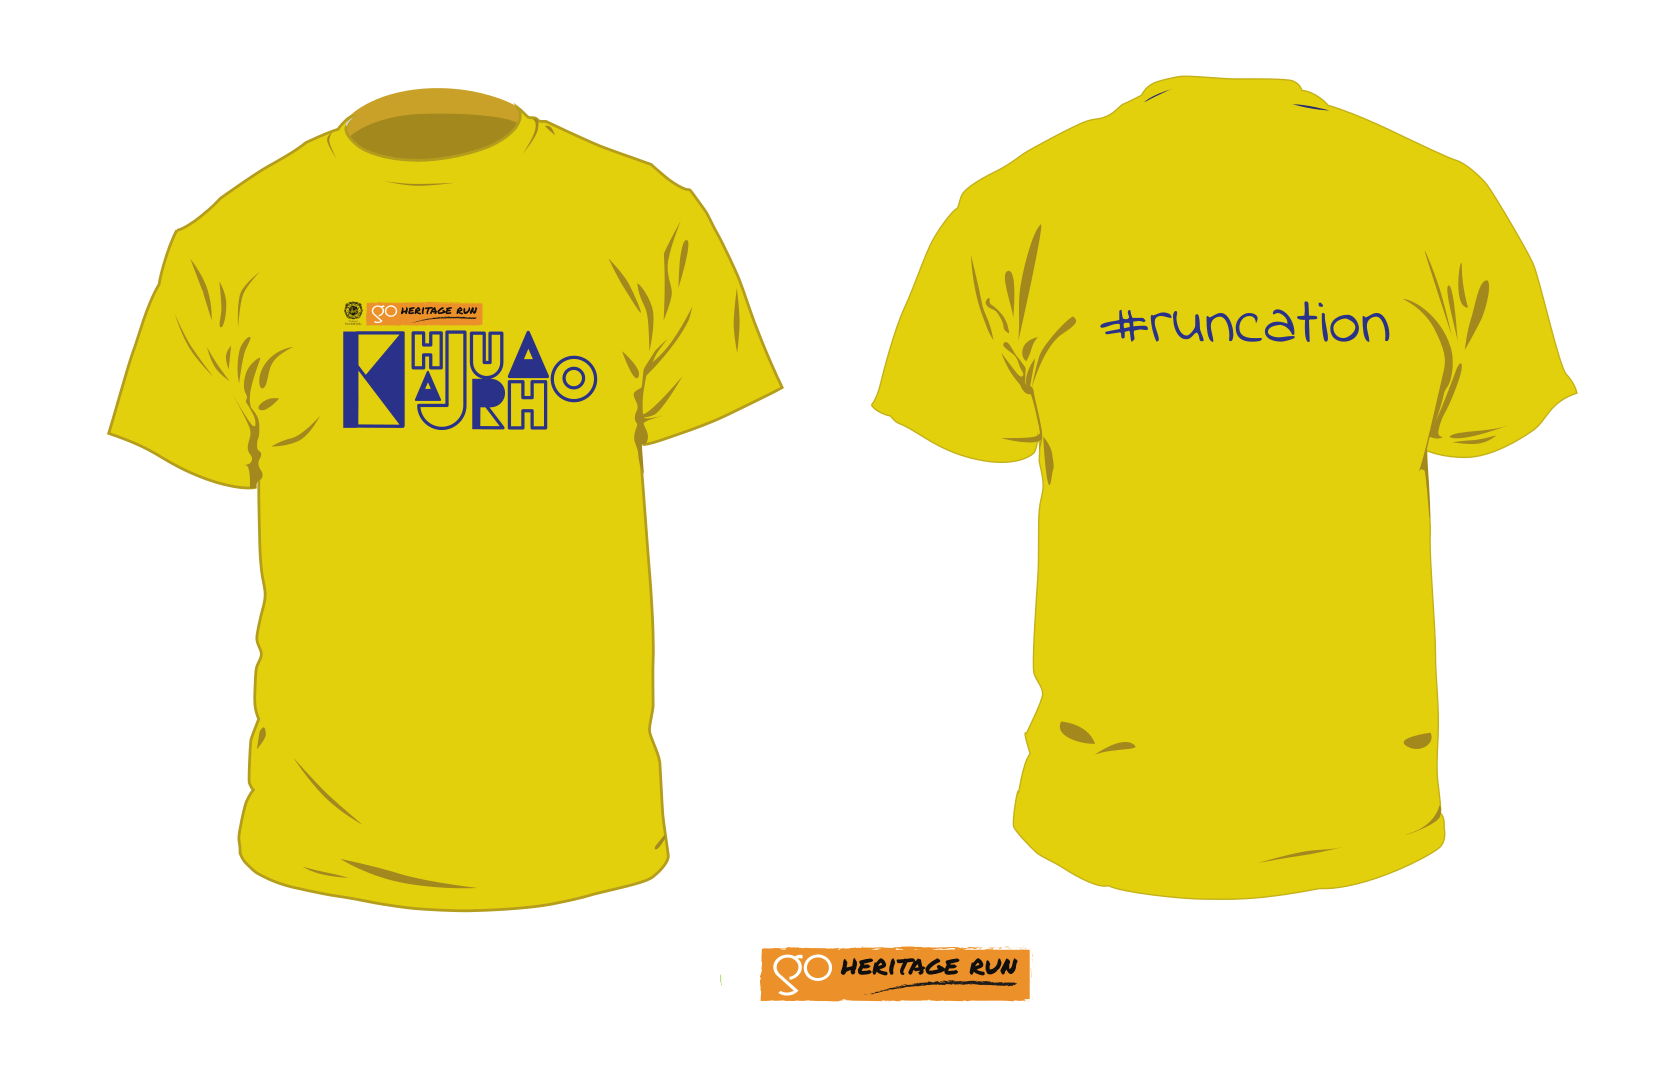 Go Heritage Run Khajuraho 2020 tshirt